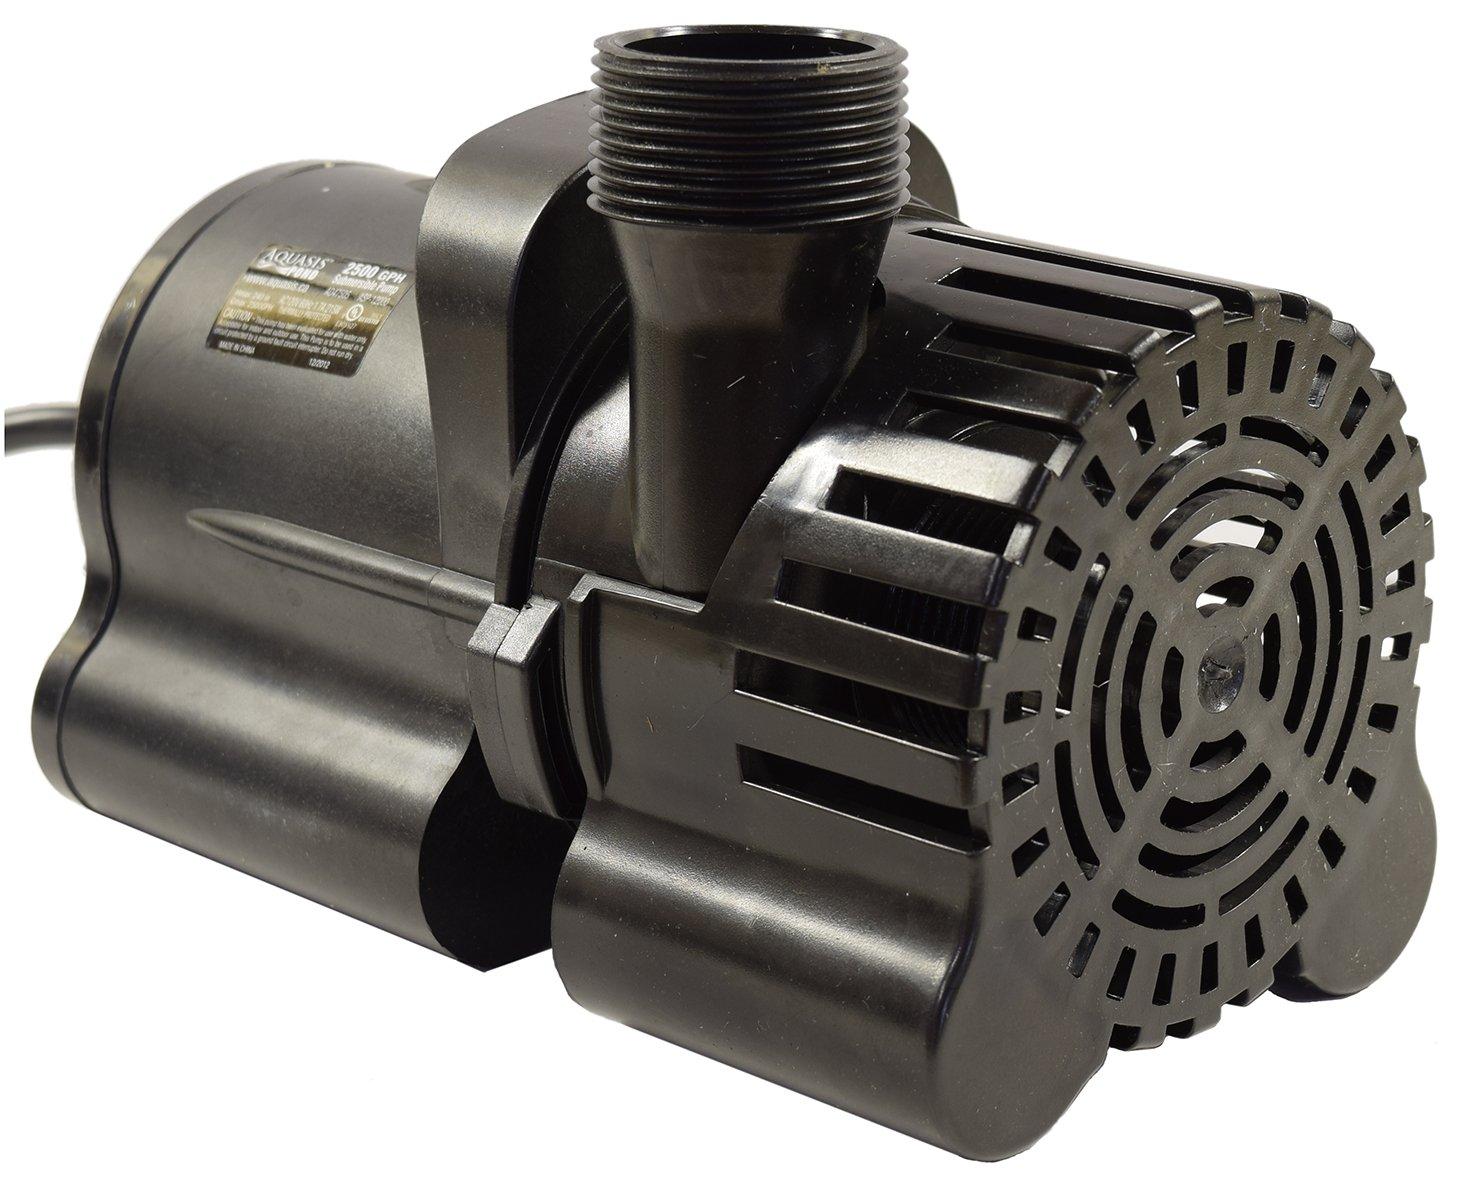 EasyPro AP2500 Aquasis 2500 GPH Pump